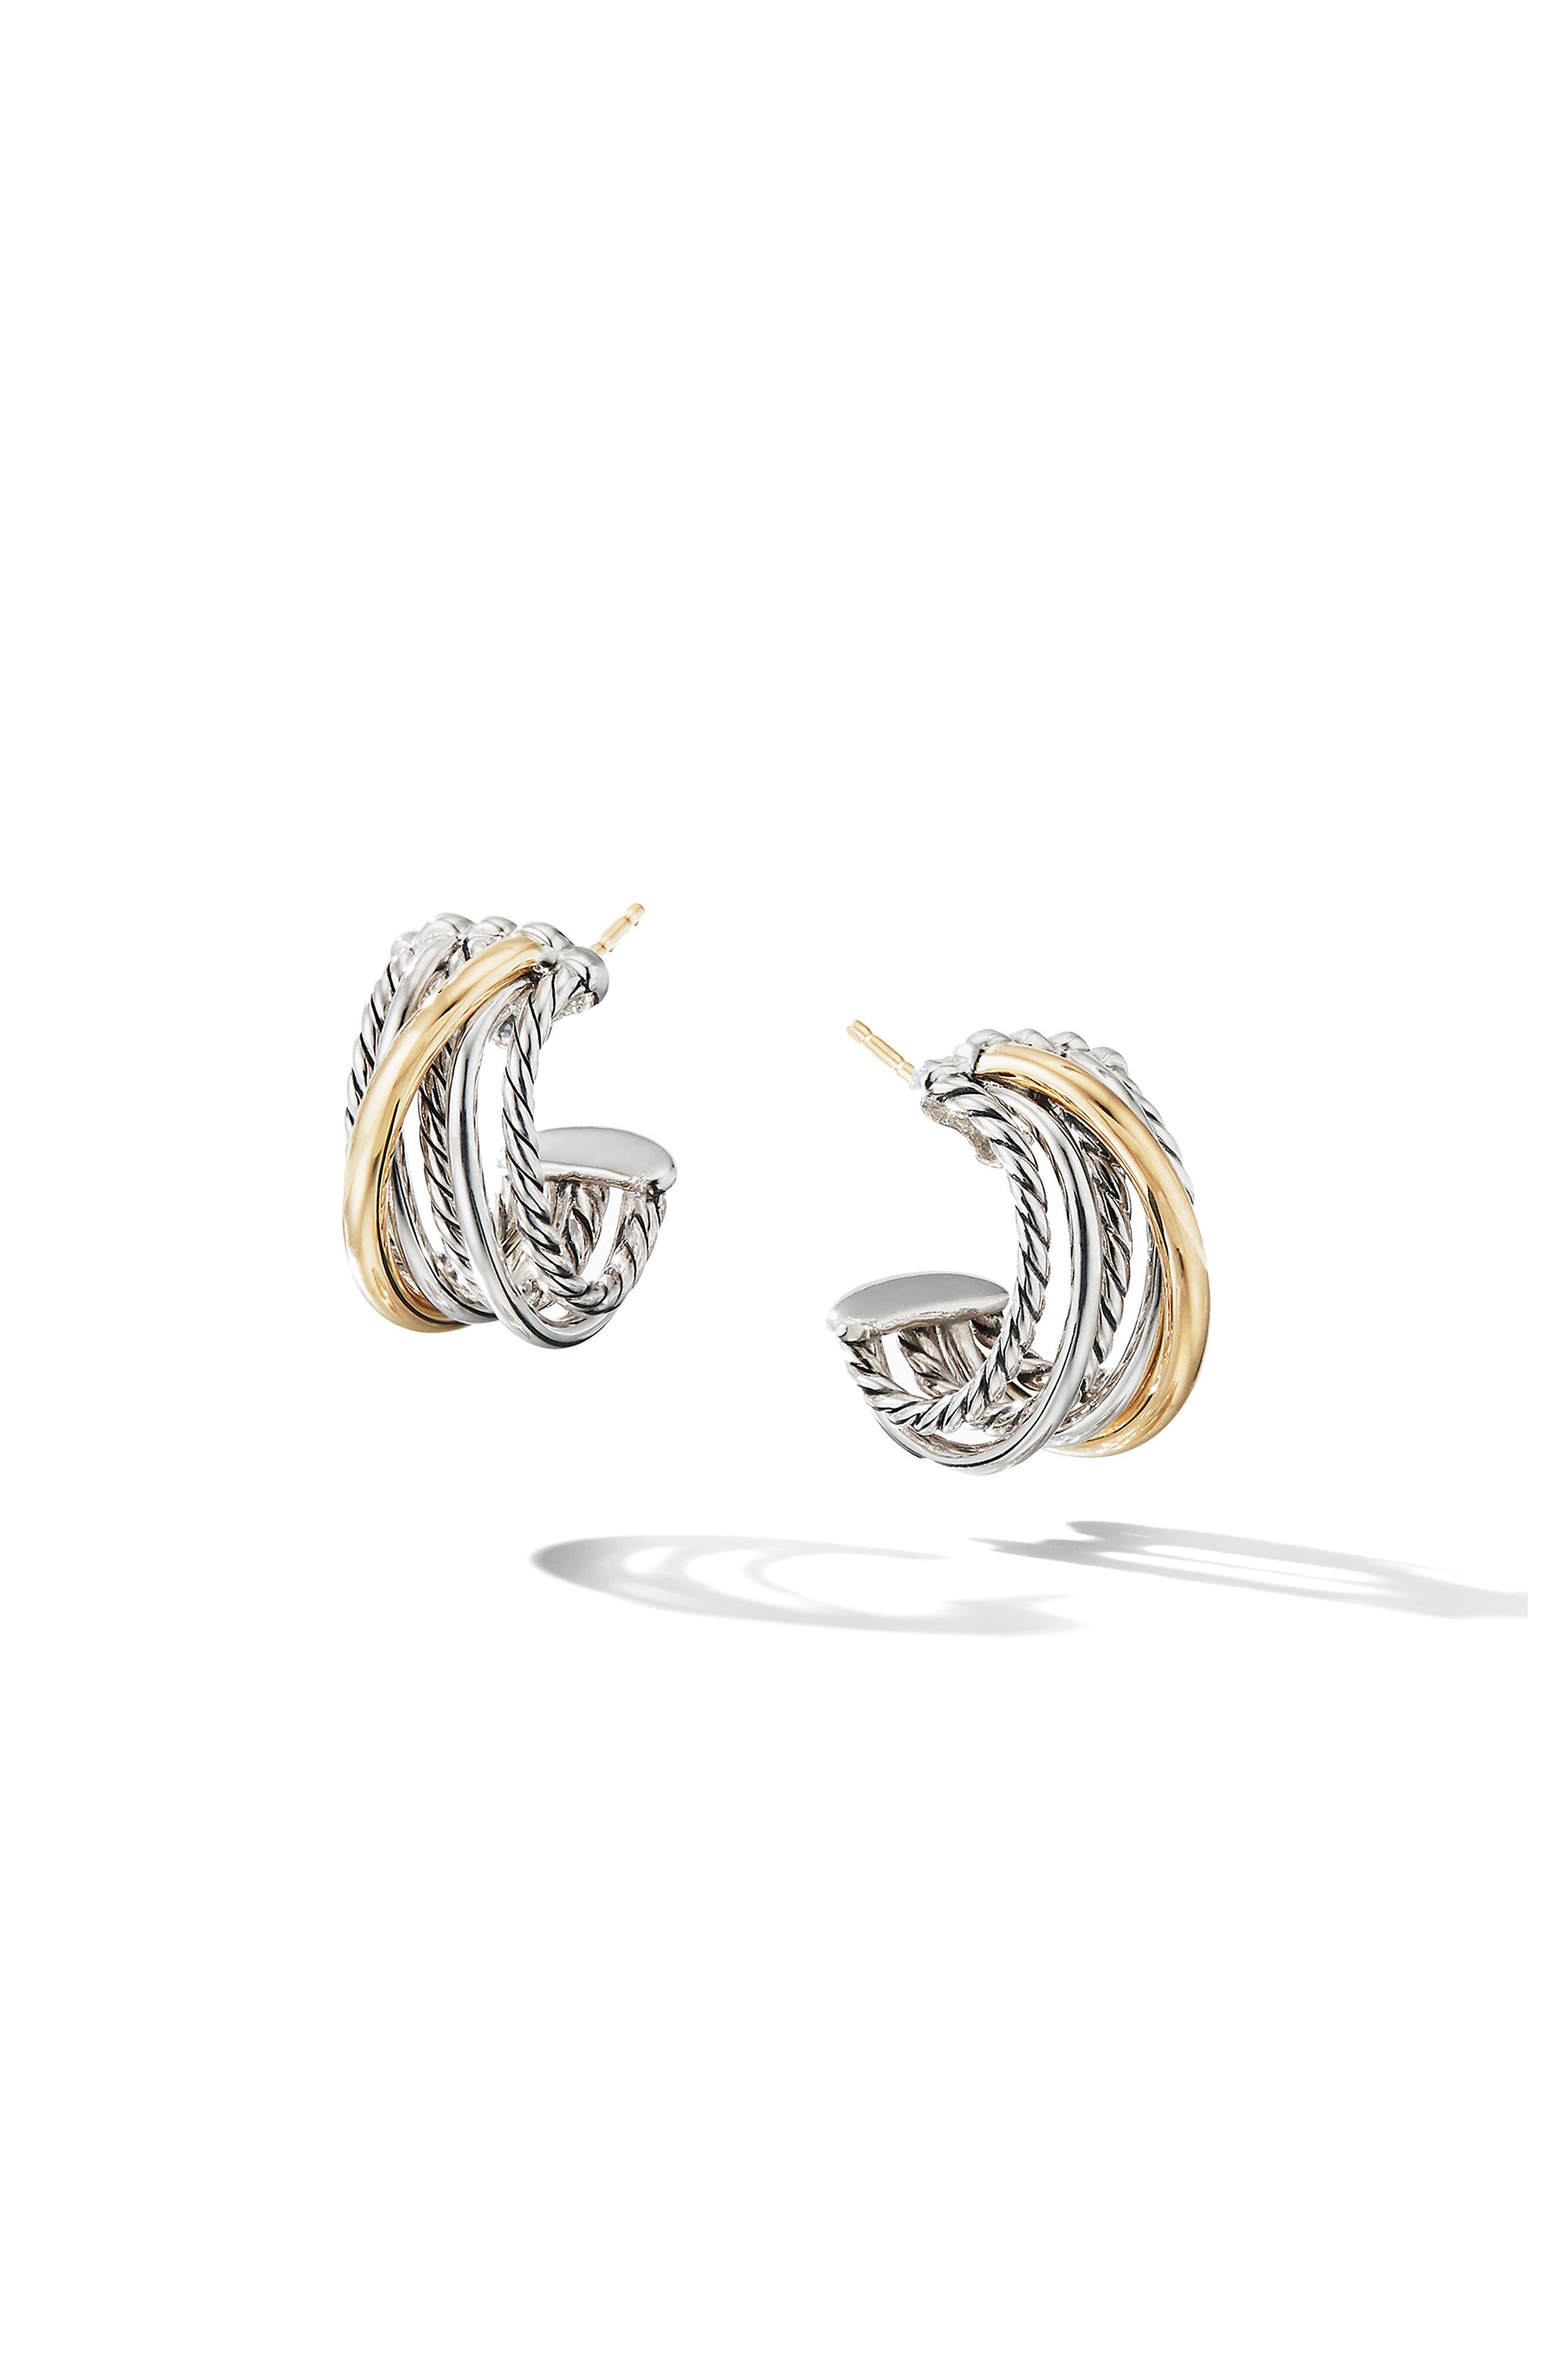 DAVID YURMAN, Crossover Huggie Hoop Earrings, Main thumbnail 1, color, SILVER/ GOLD